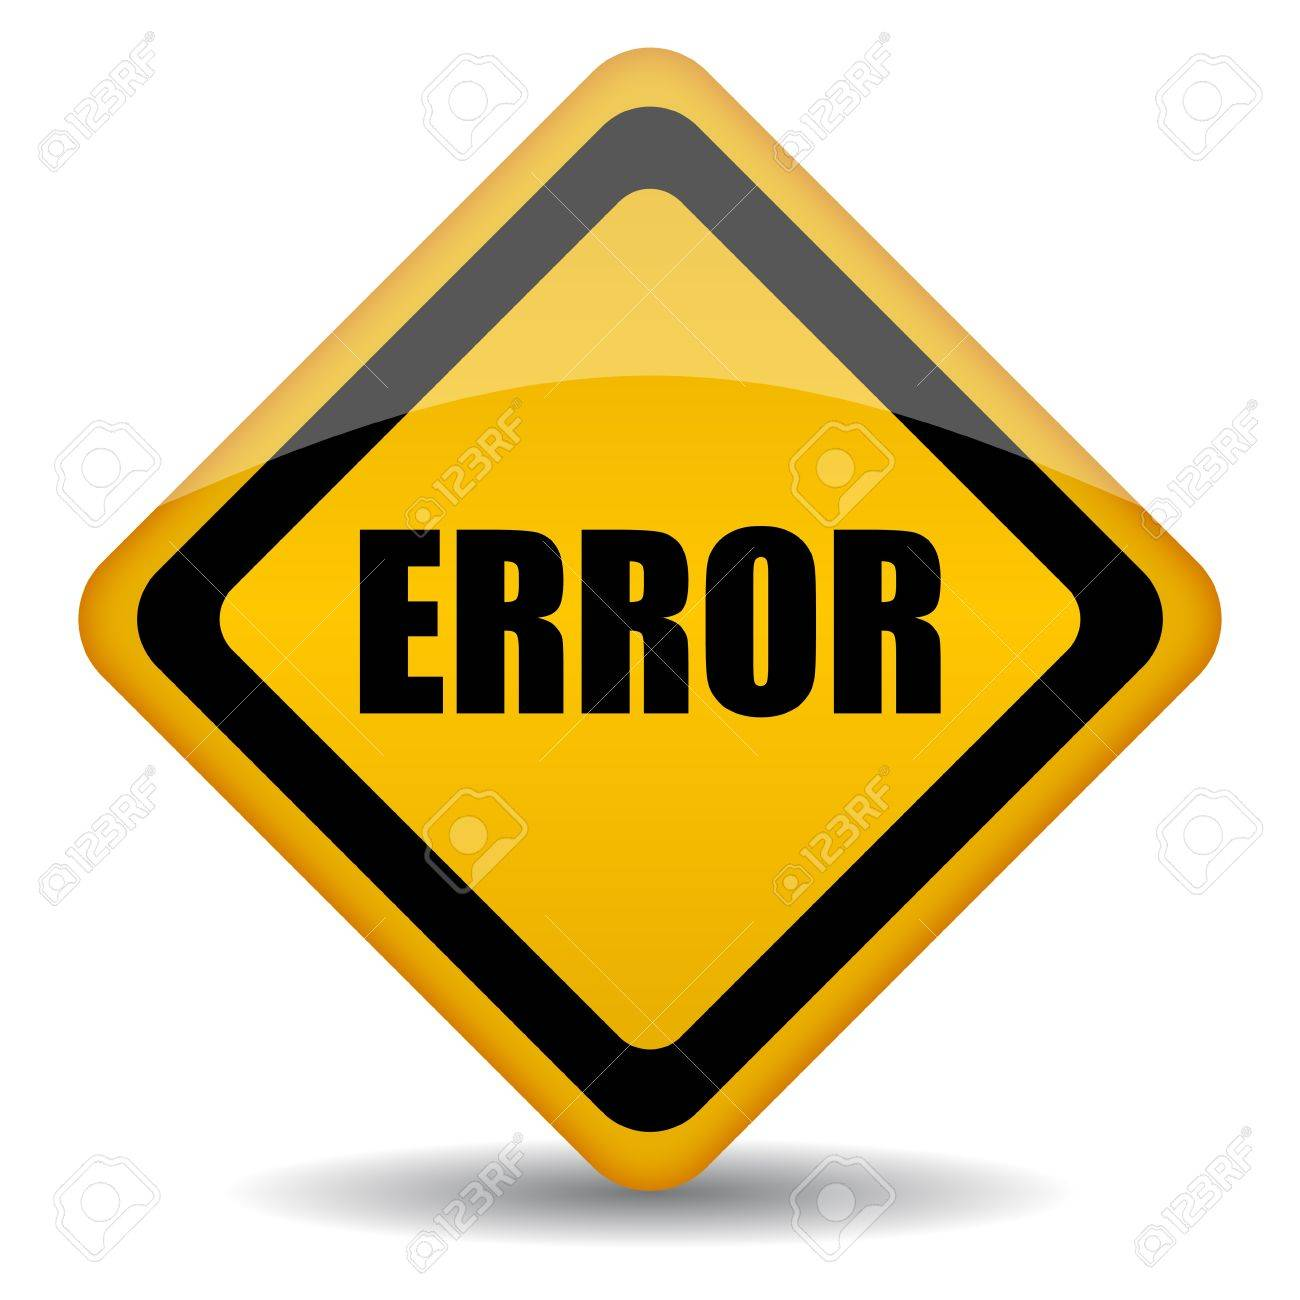 error sign illustration Stock Vector - 14318376